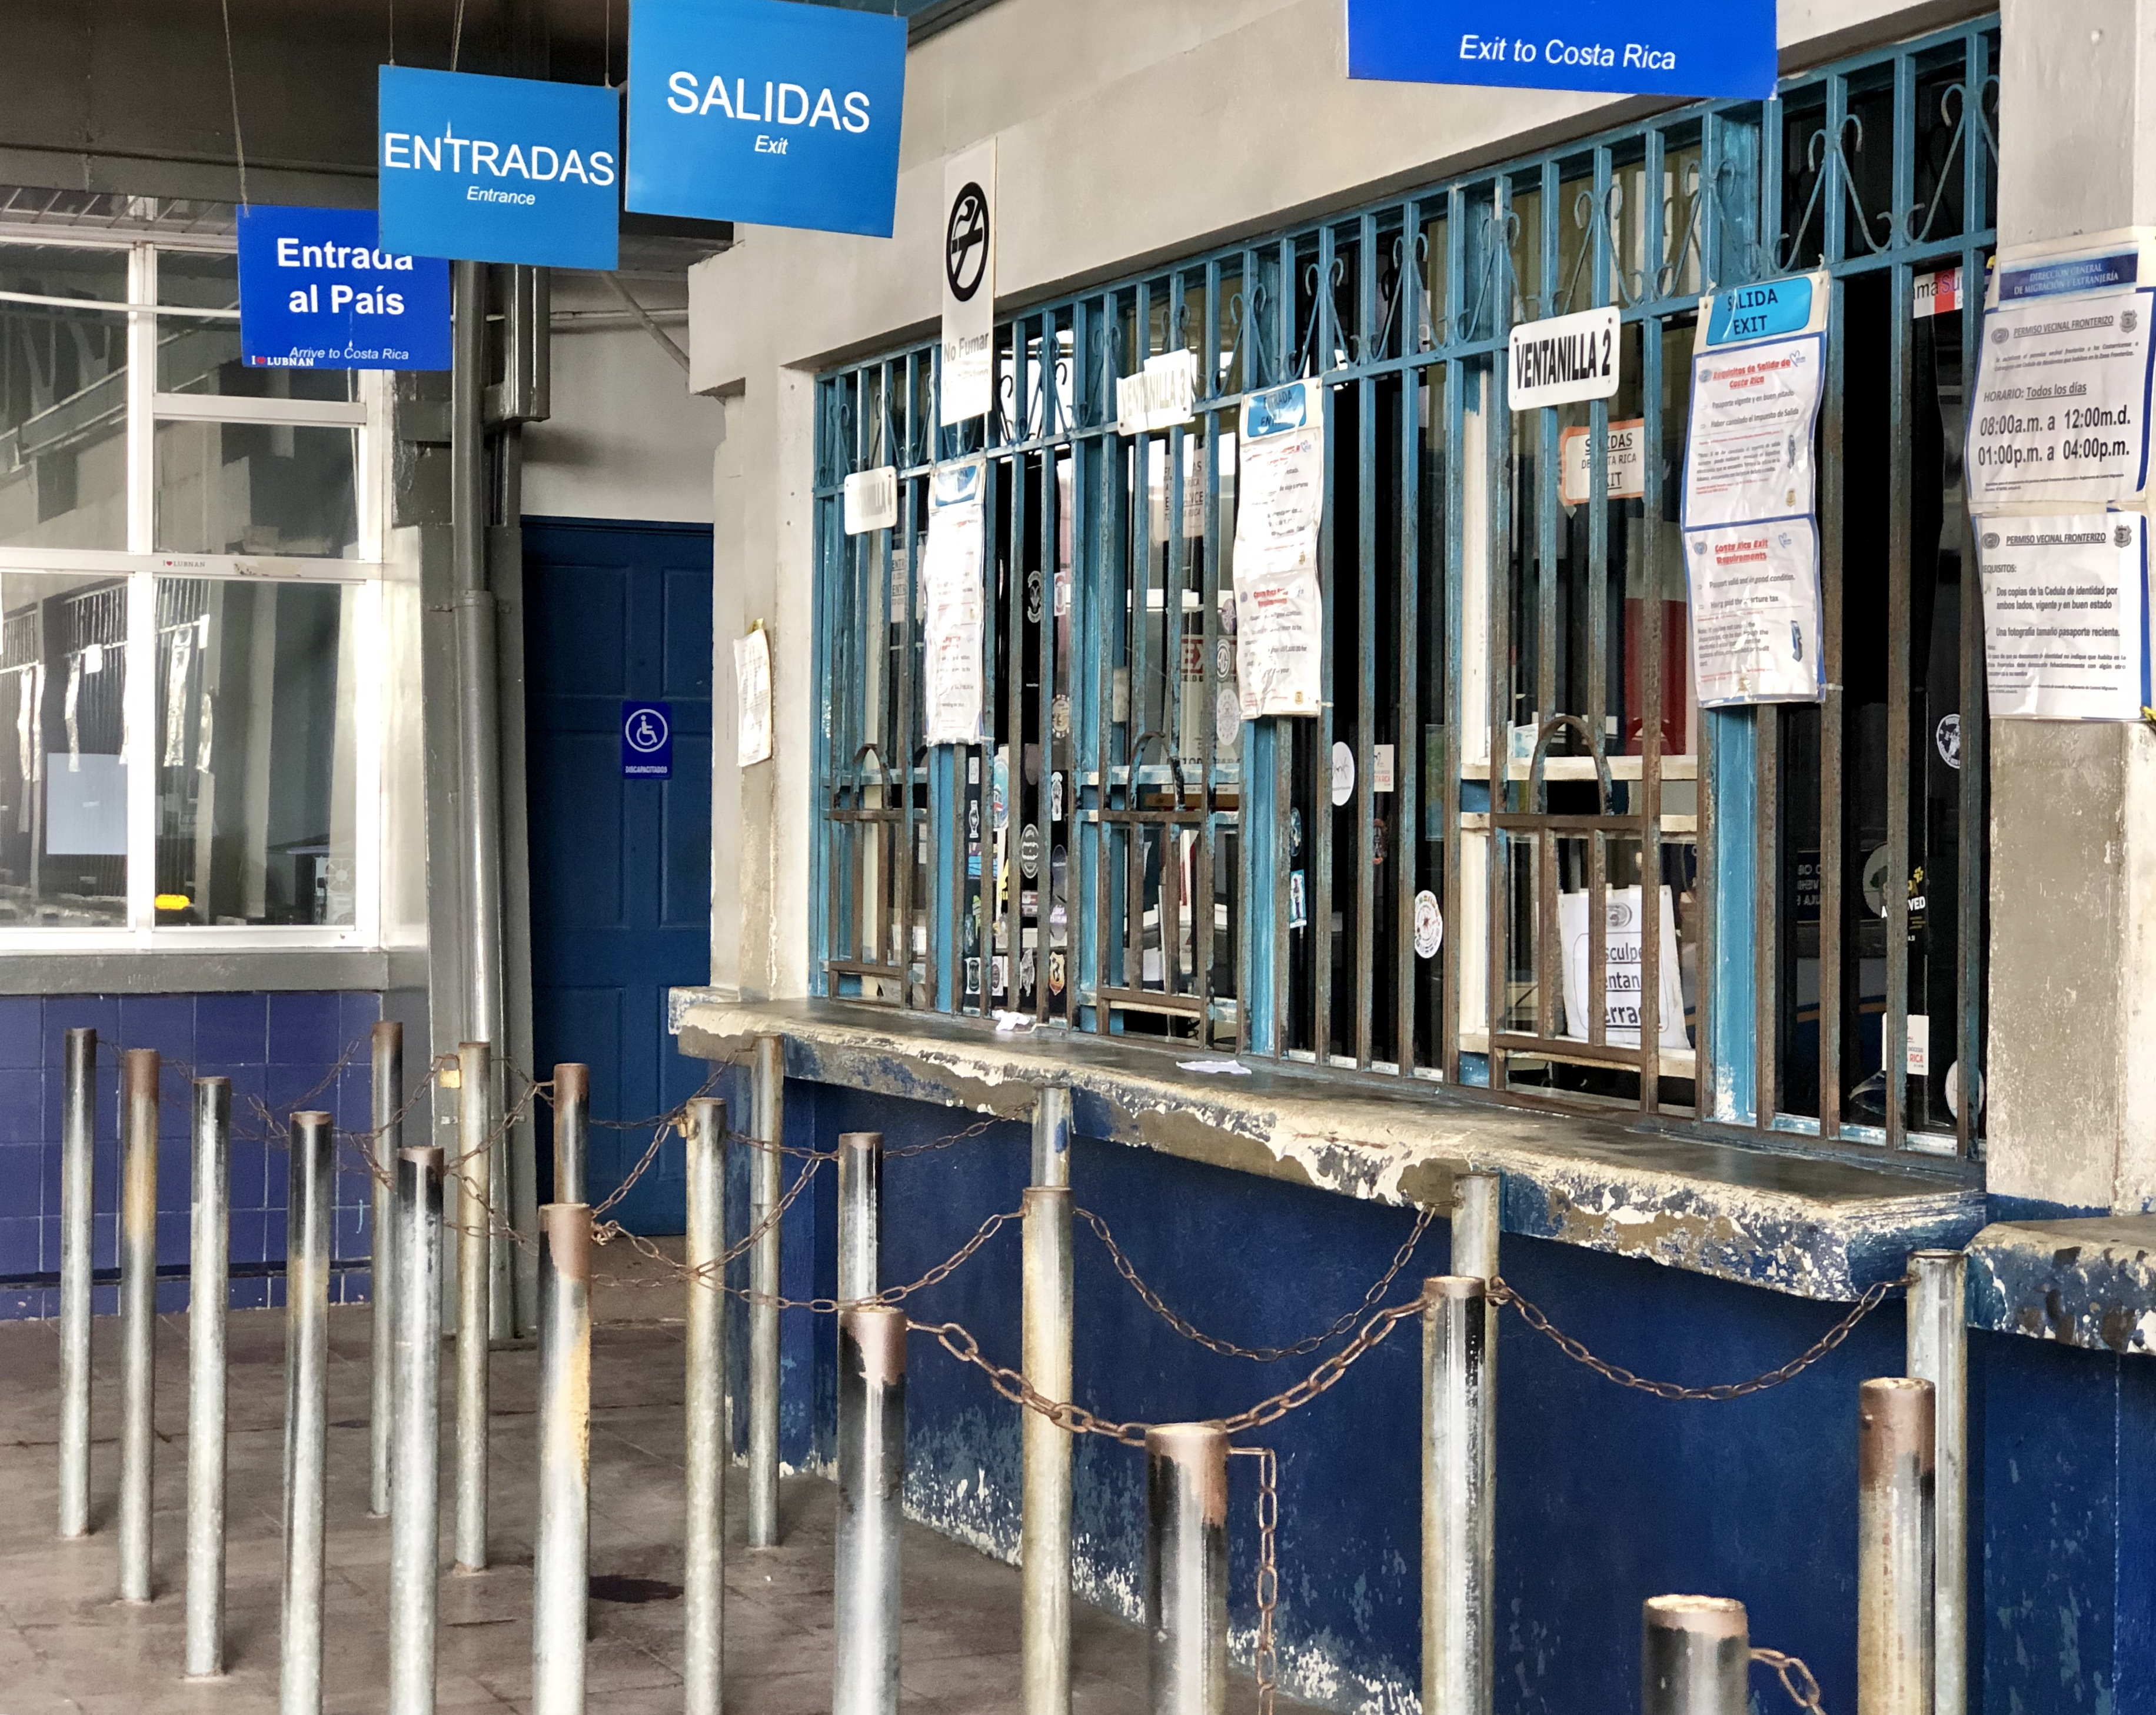 CR immigration window